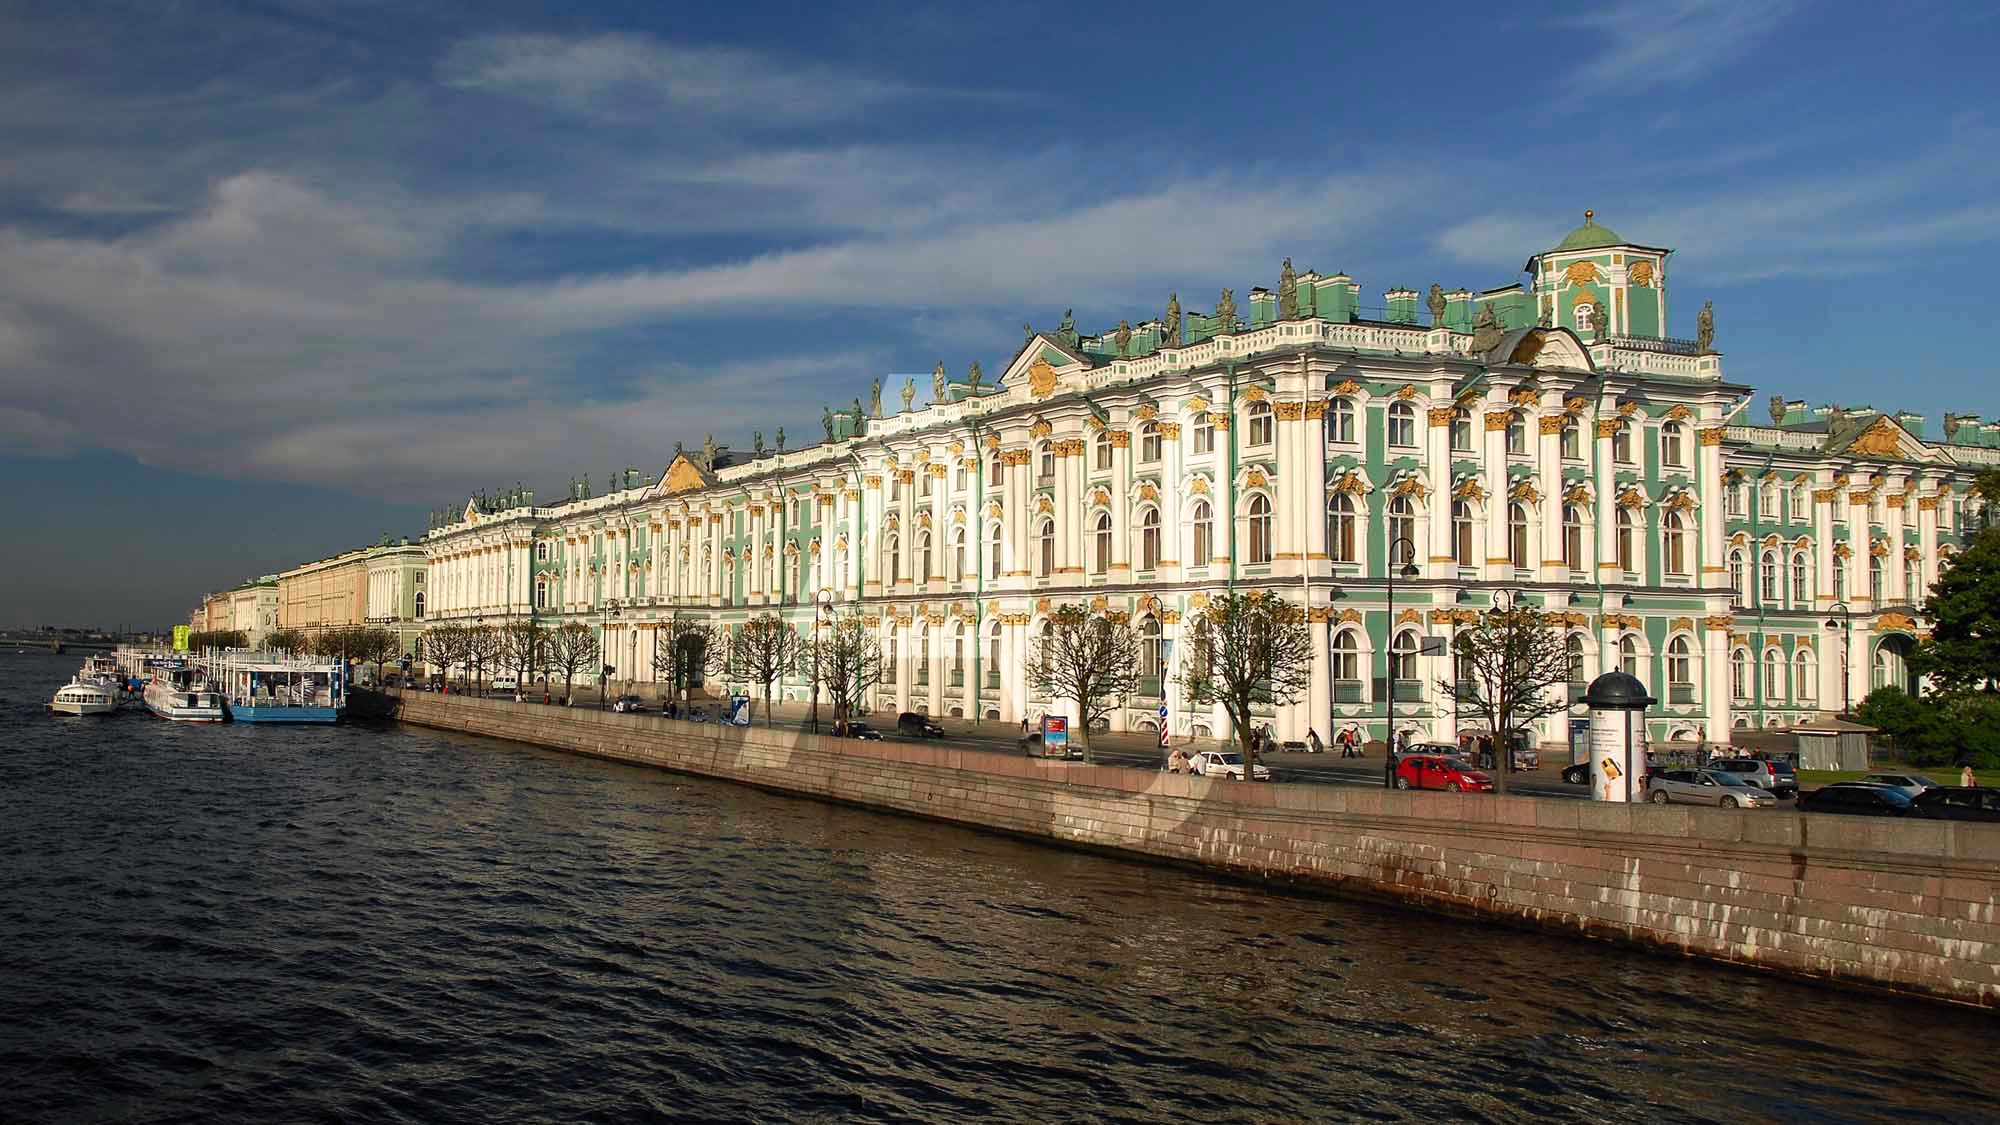 <i>Eremitage, Sankt Petersburg (Russia)<i>